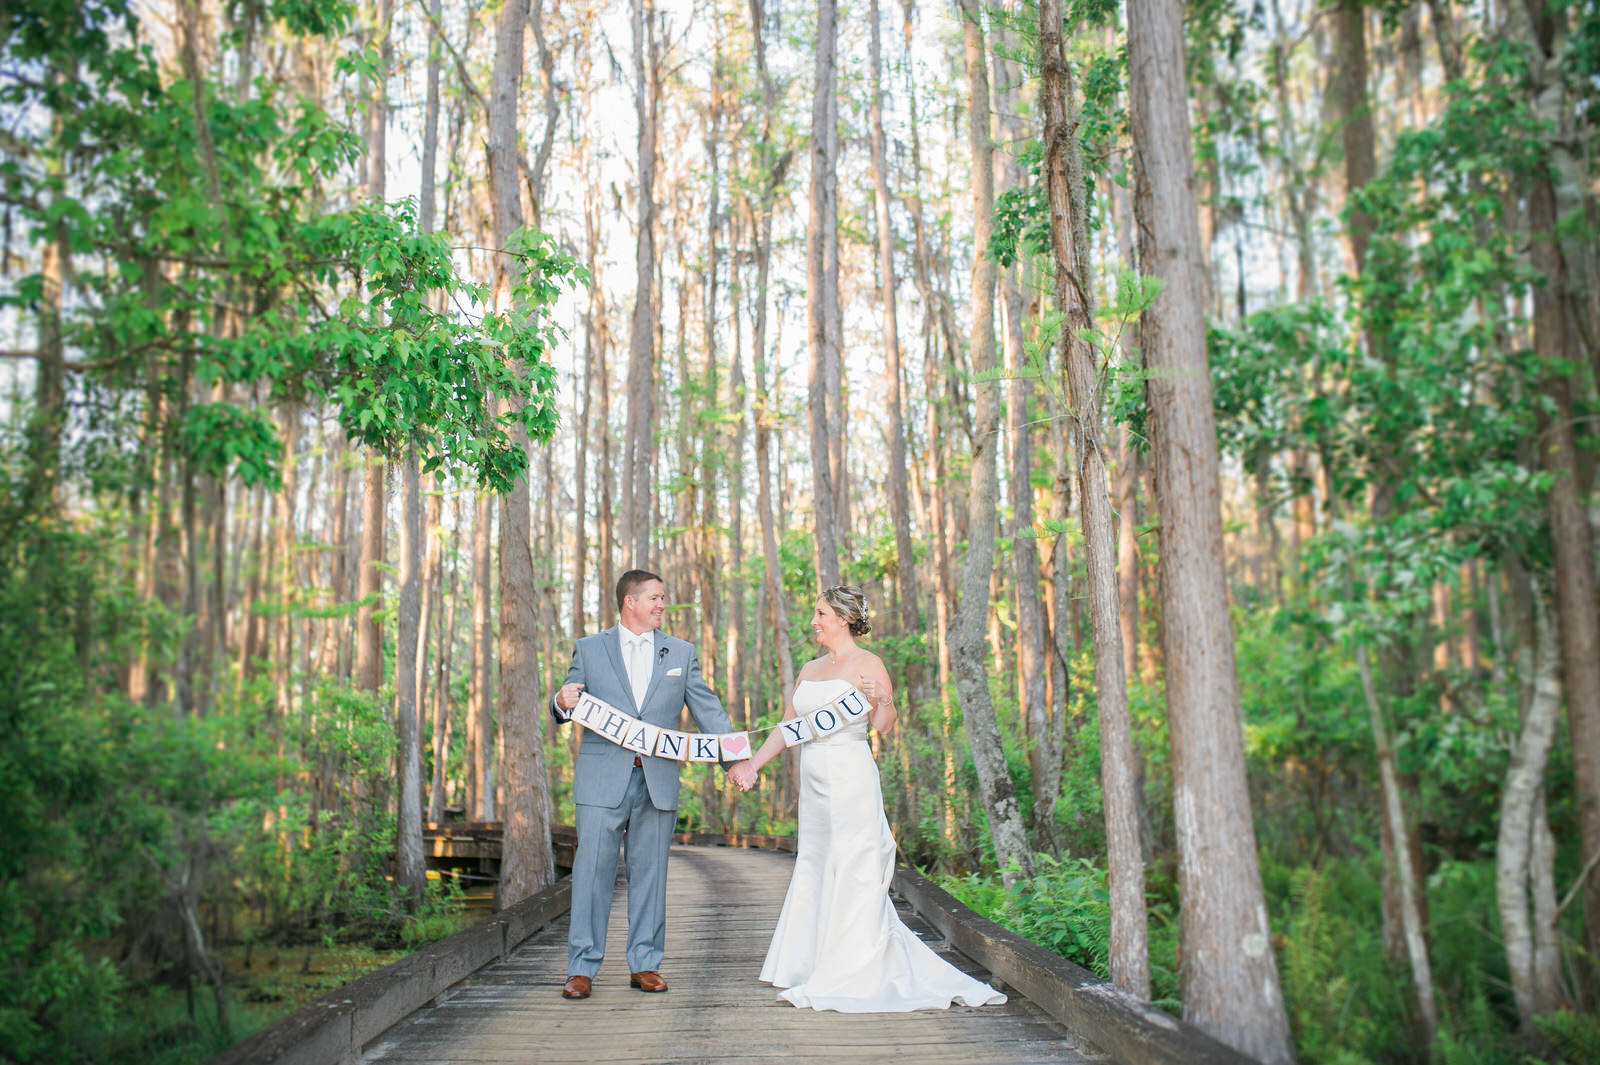 Mike_&_Barbaras_Wedding_3_24_2018-229.jpg